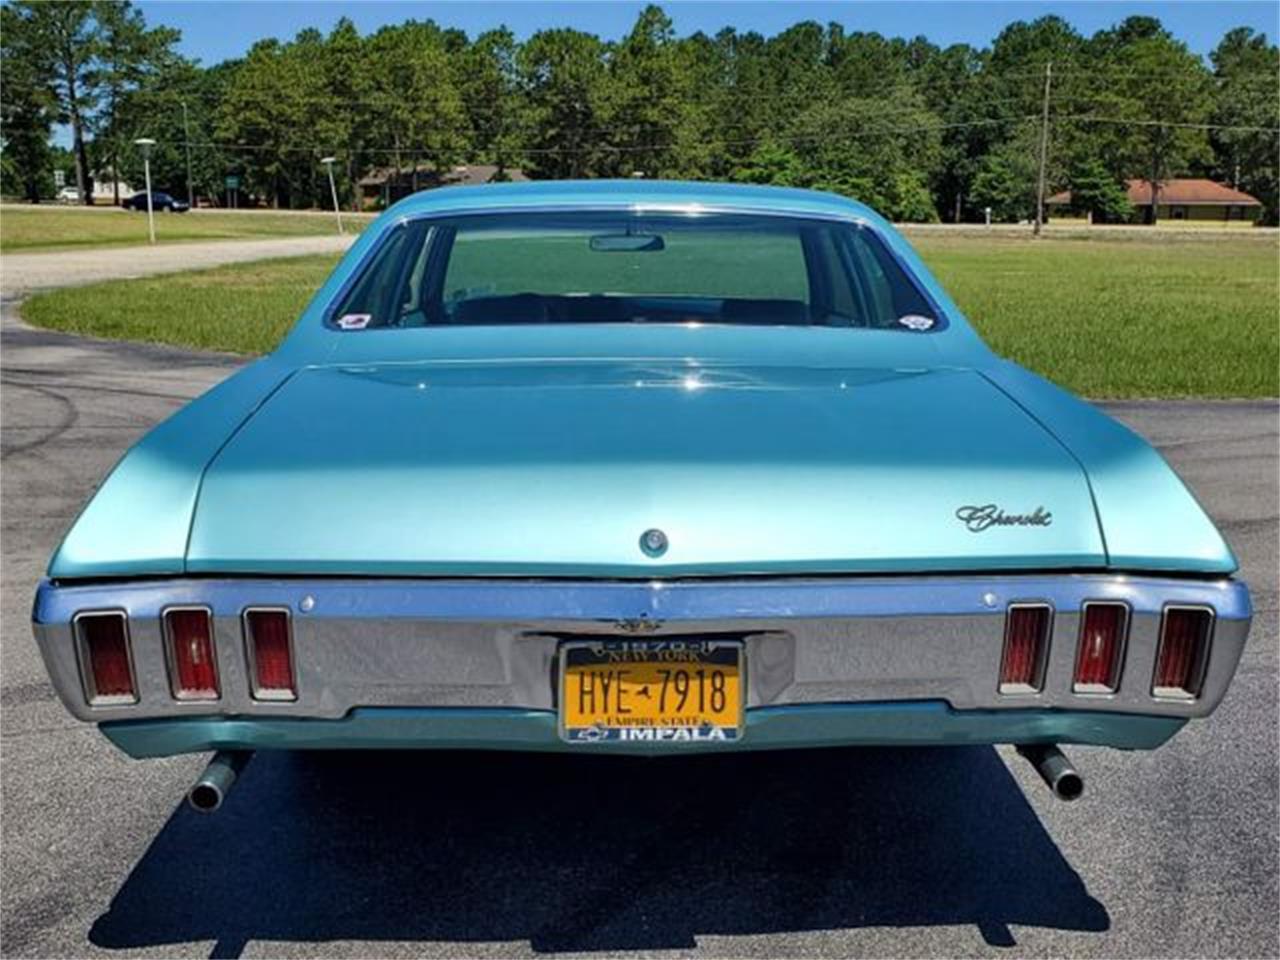 1970 Chevrolet Impala (CC-1237745) for sale in Hope Mills, North Carolina